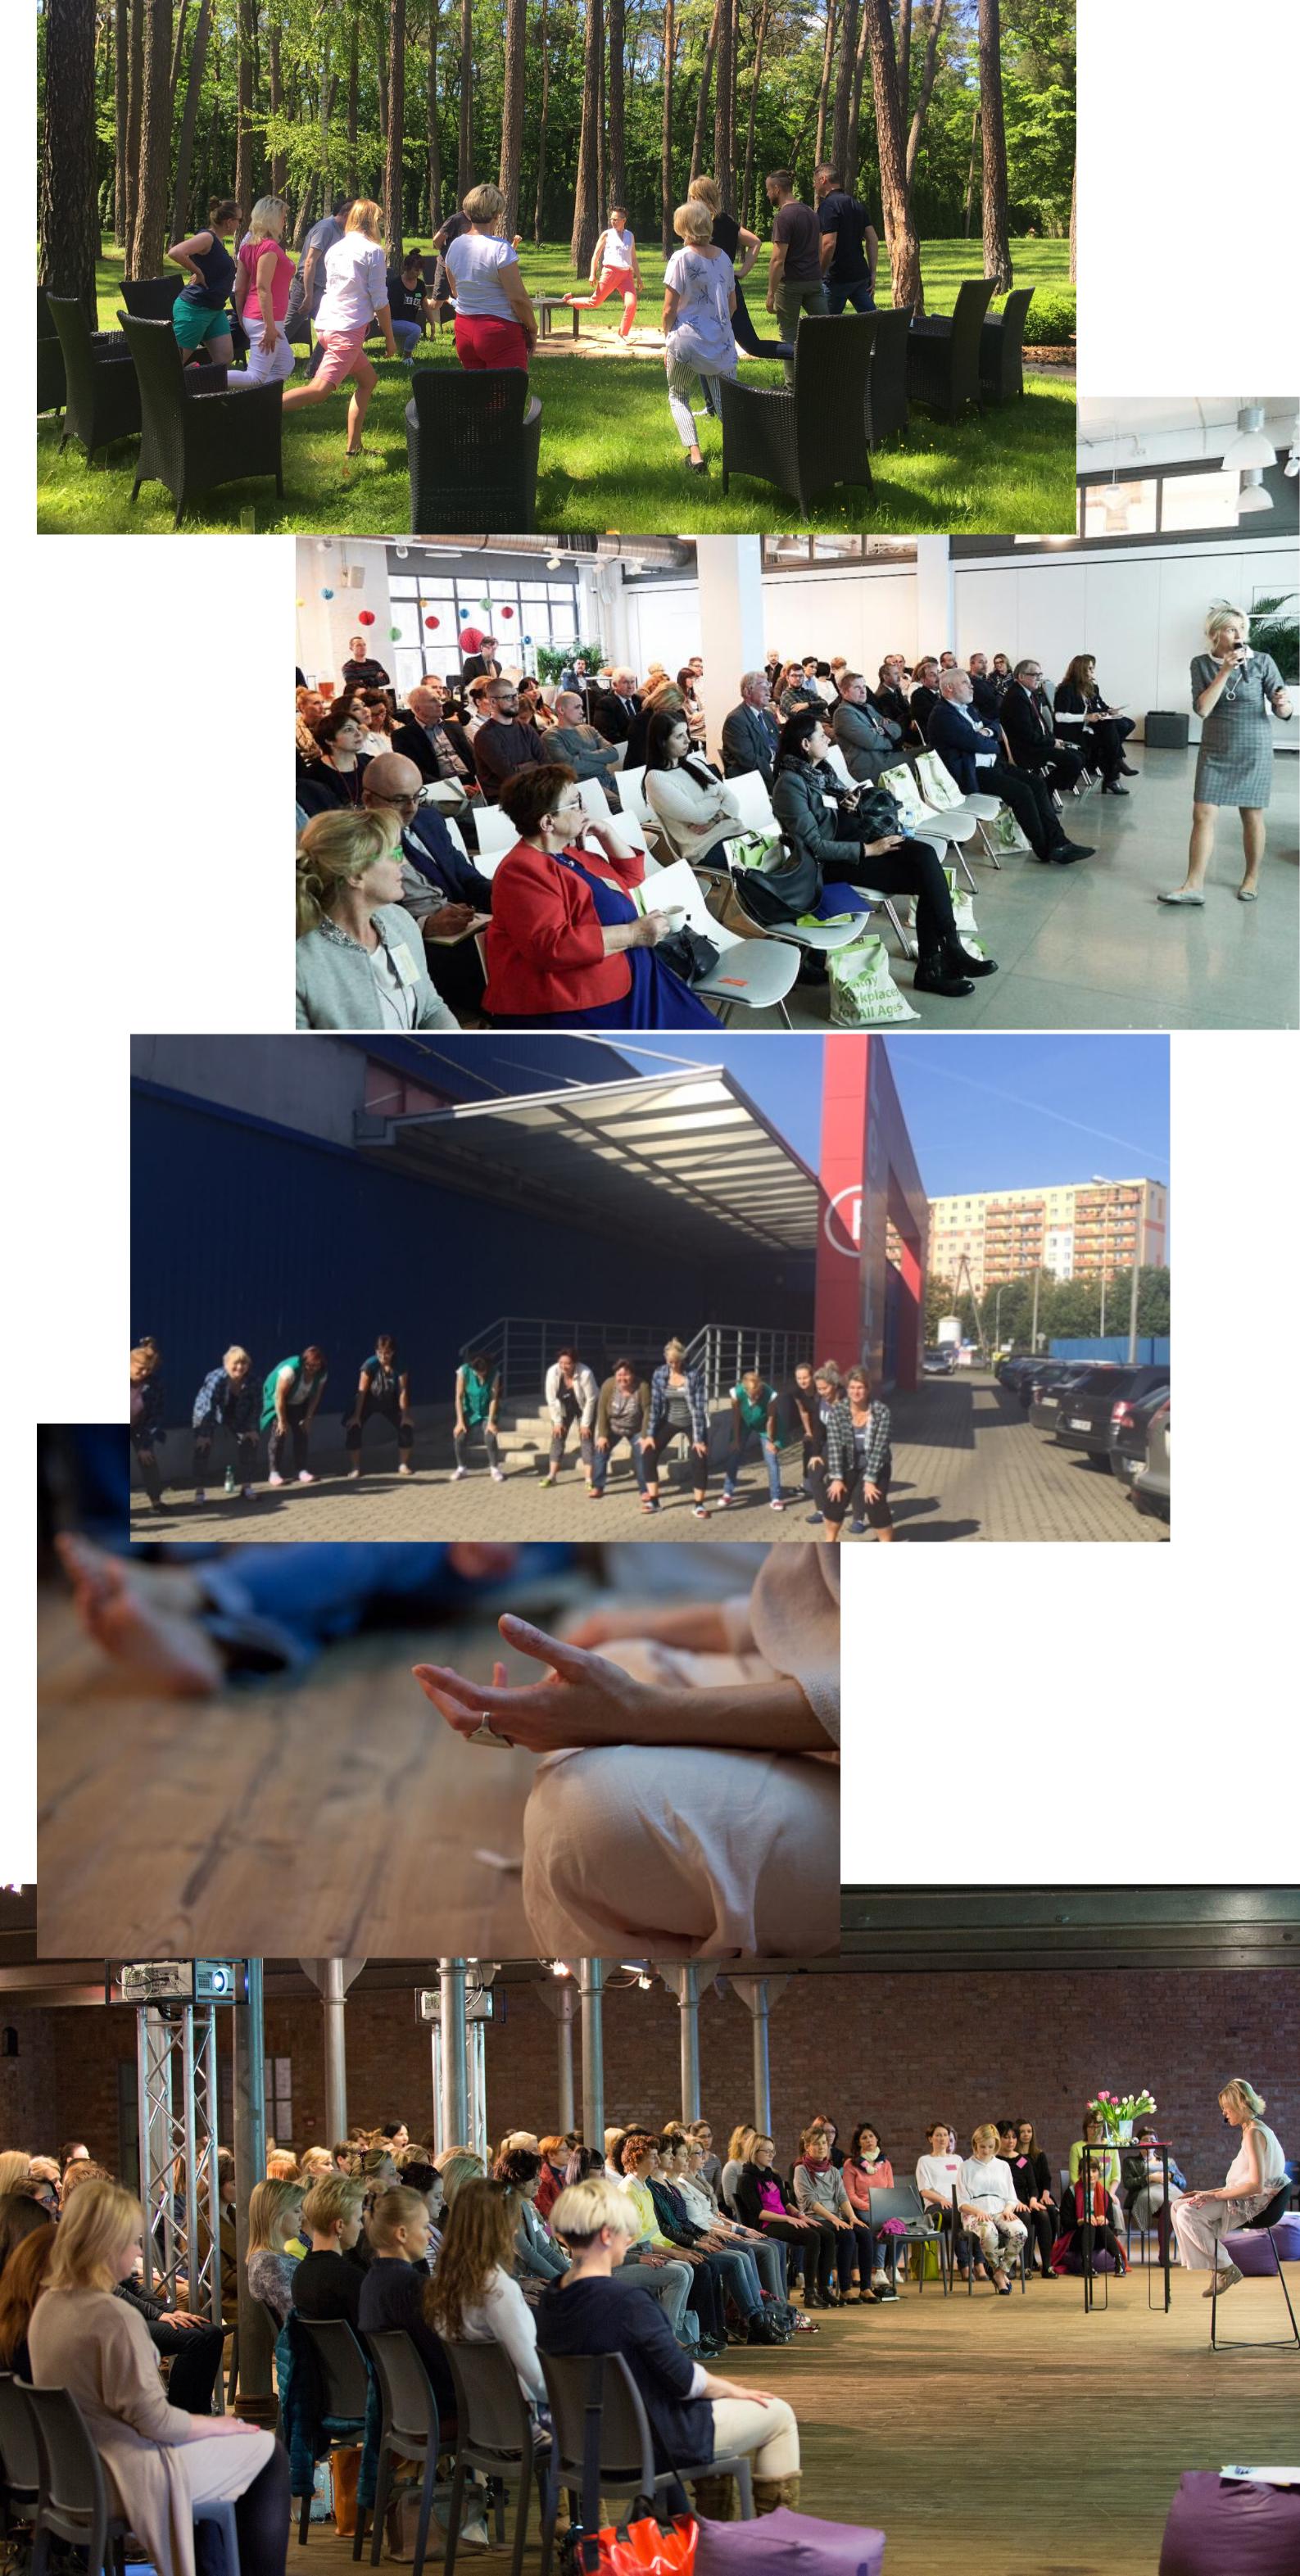 http://akademia.prodialog.pl/wp-content/uploads/2020/05/pion-strona-pro-dialog-akademii-4.png